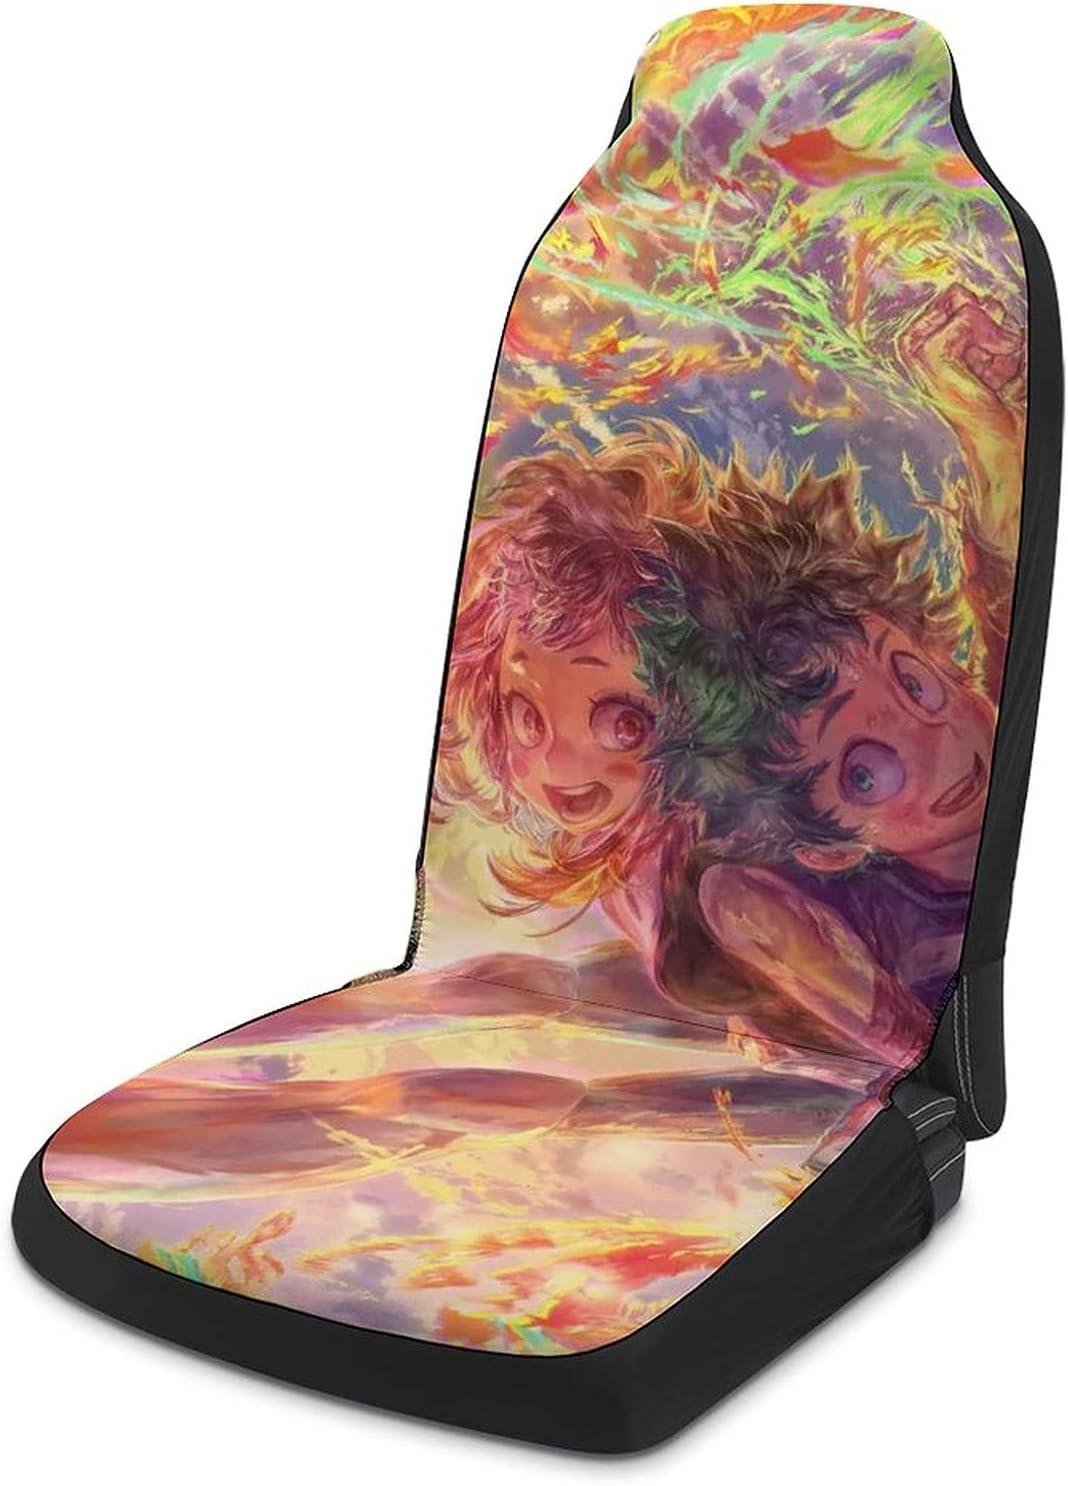 Izuku Midoriya Ochaco Uraraka Excellence Seat Covers Car Protecto OFFicial mail order